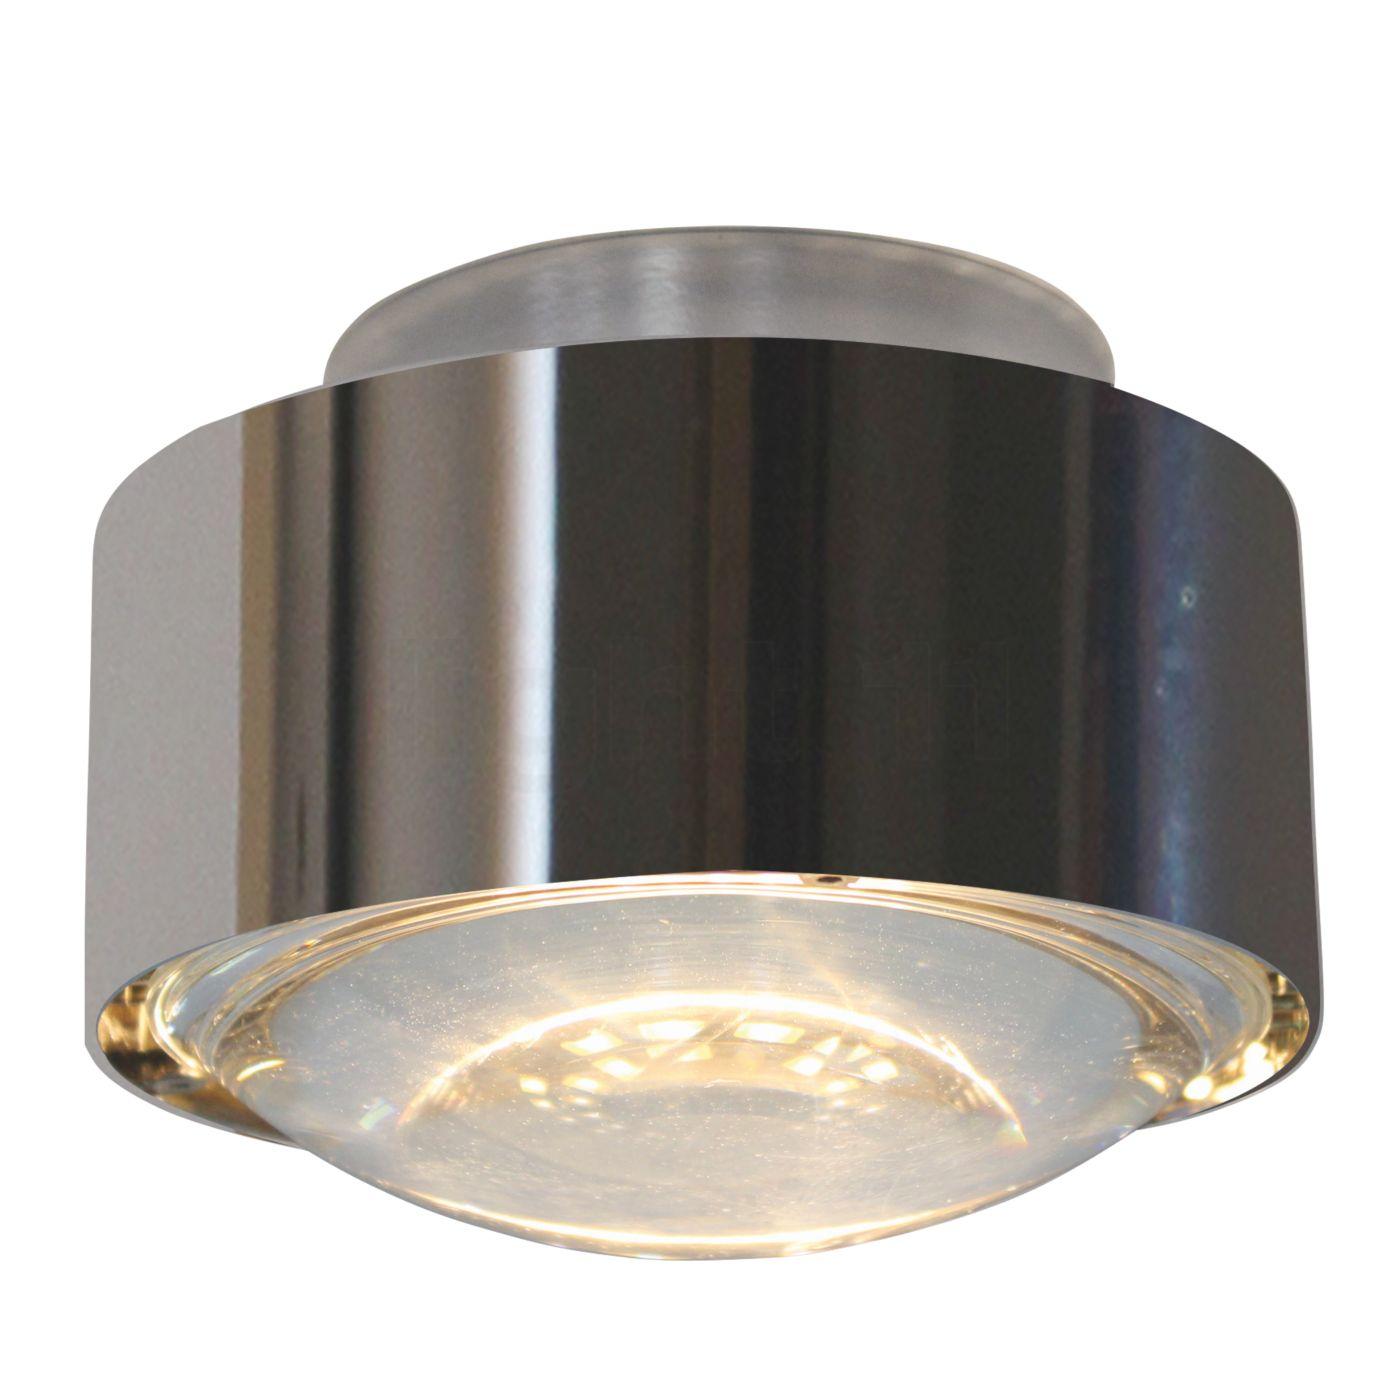 top light puk meg maxx plus led plafonnier. Black Bedroom Furniture Sets. Home Design Ideas